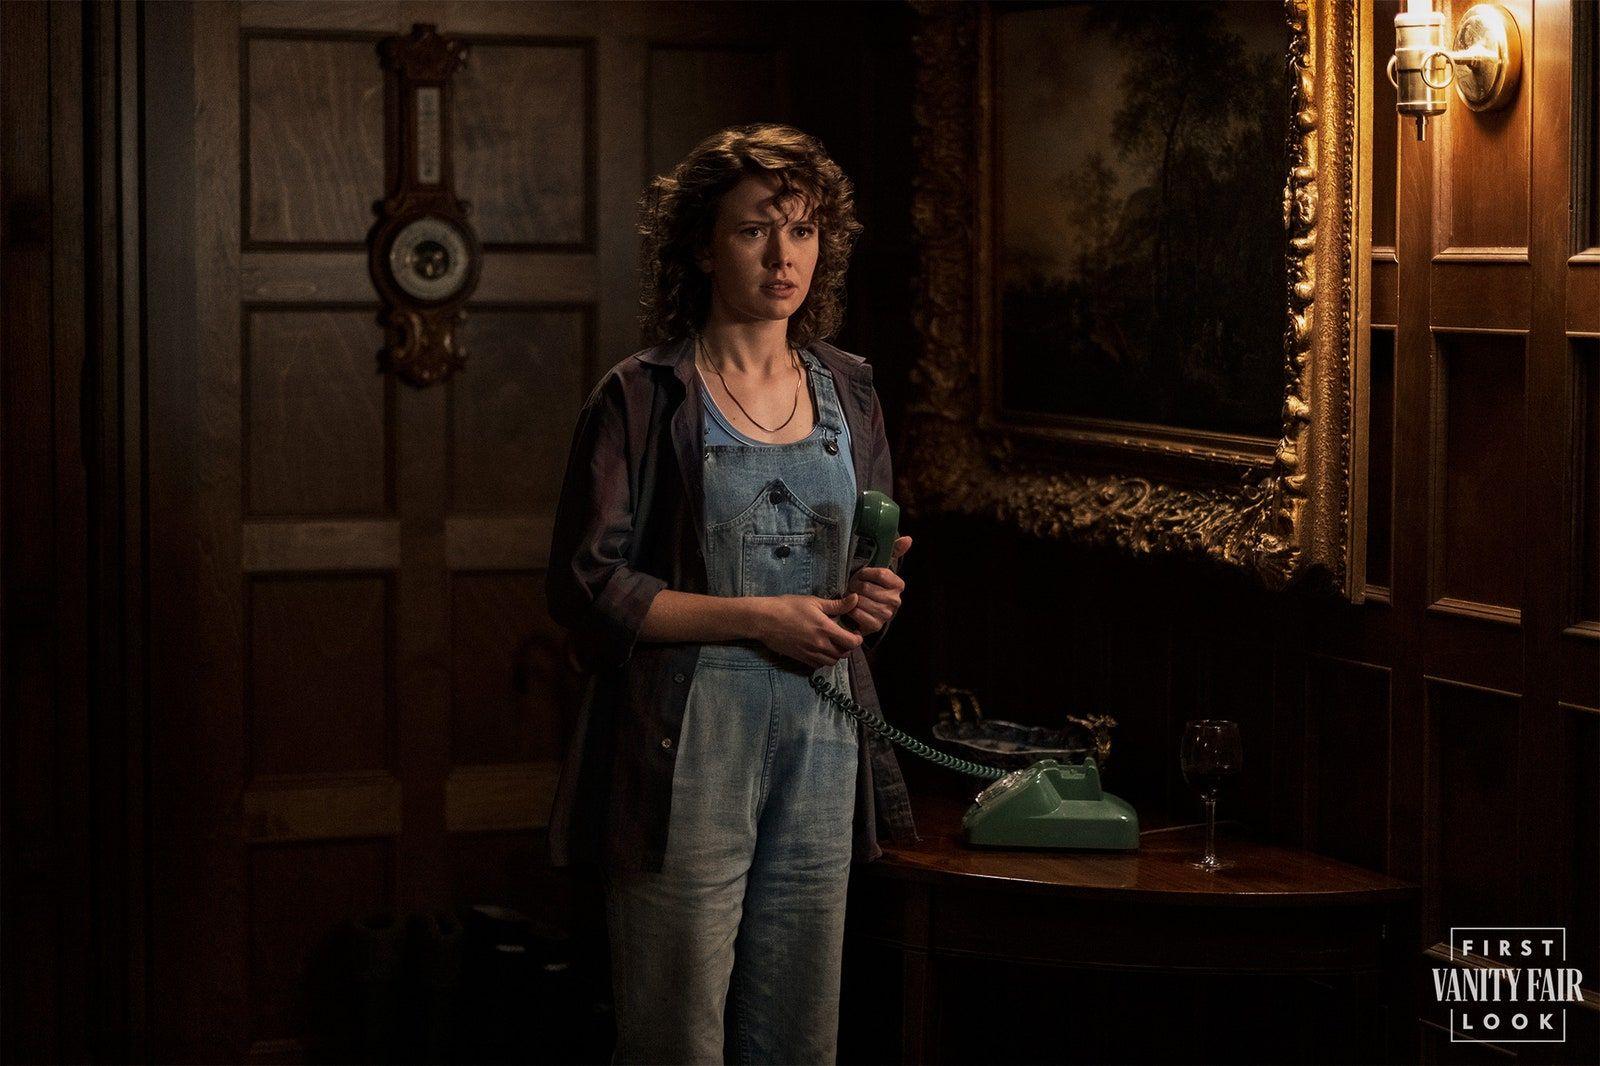 Amelia Eve's Jamie gets an alarming call. EIKE SCHROTER/NETFLIX